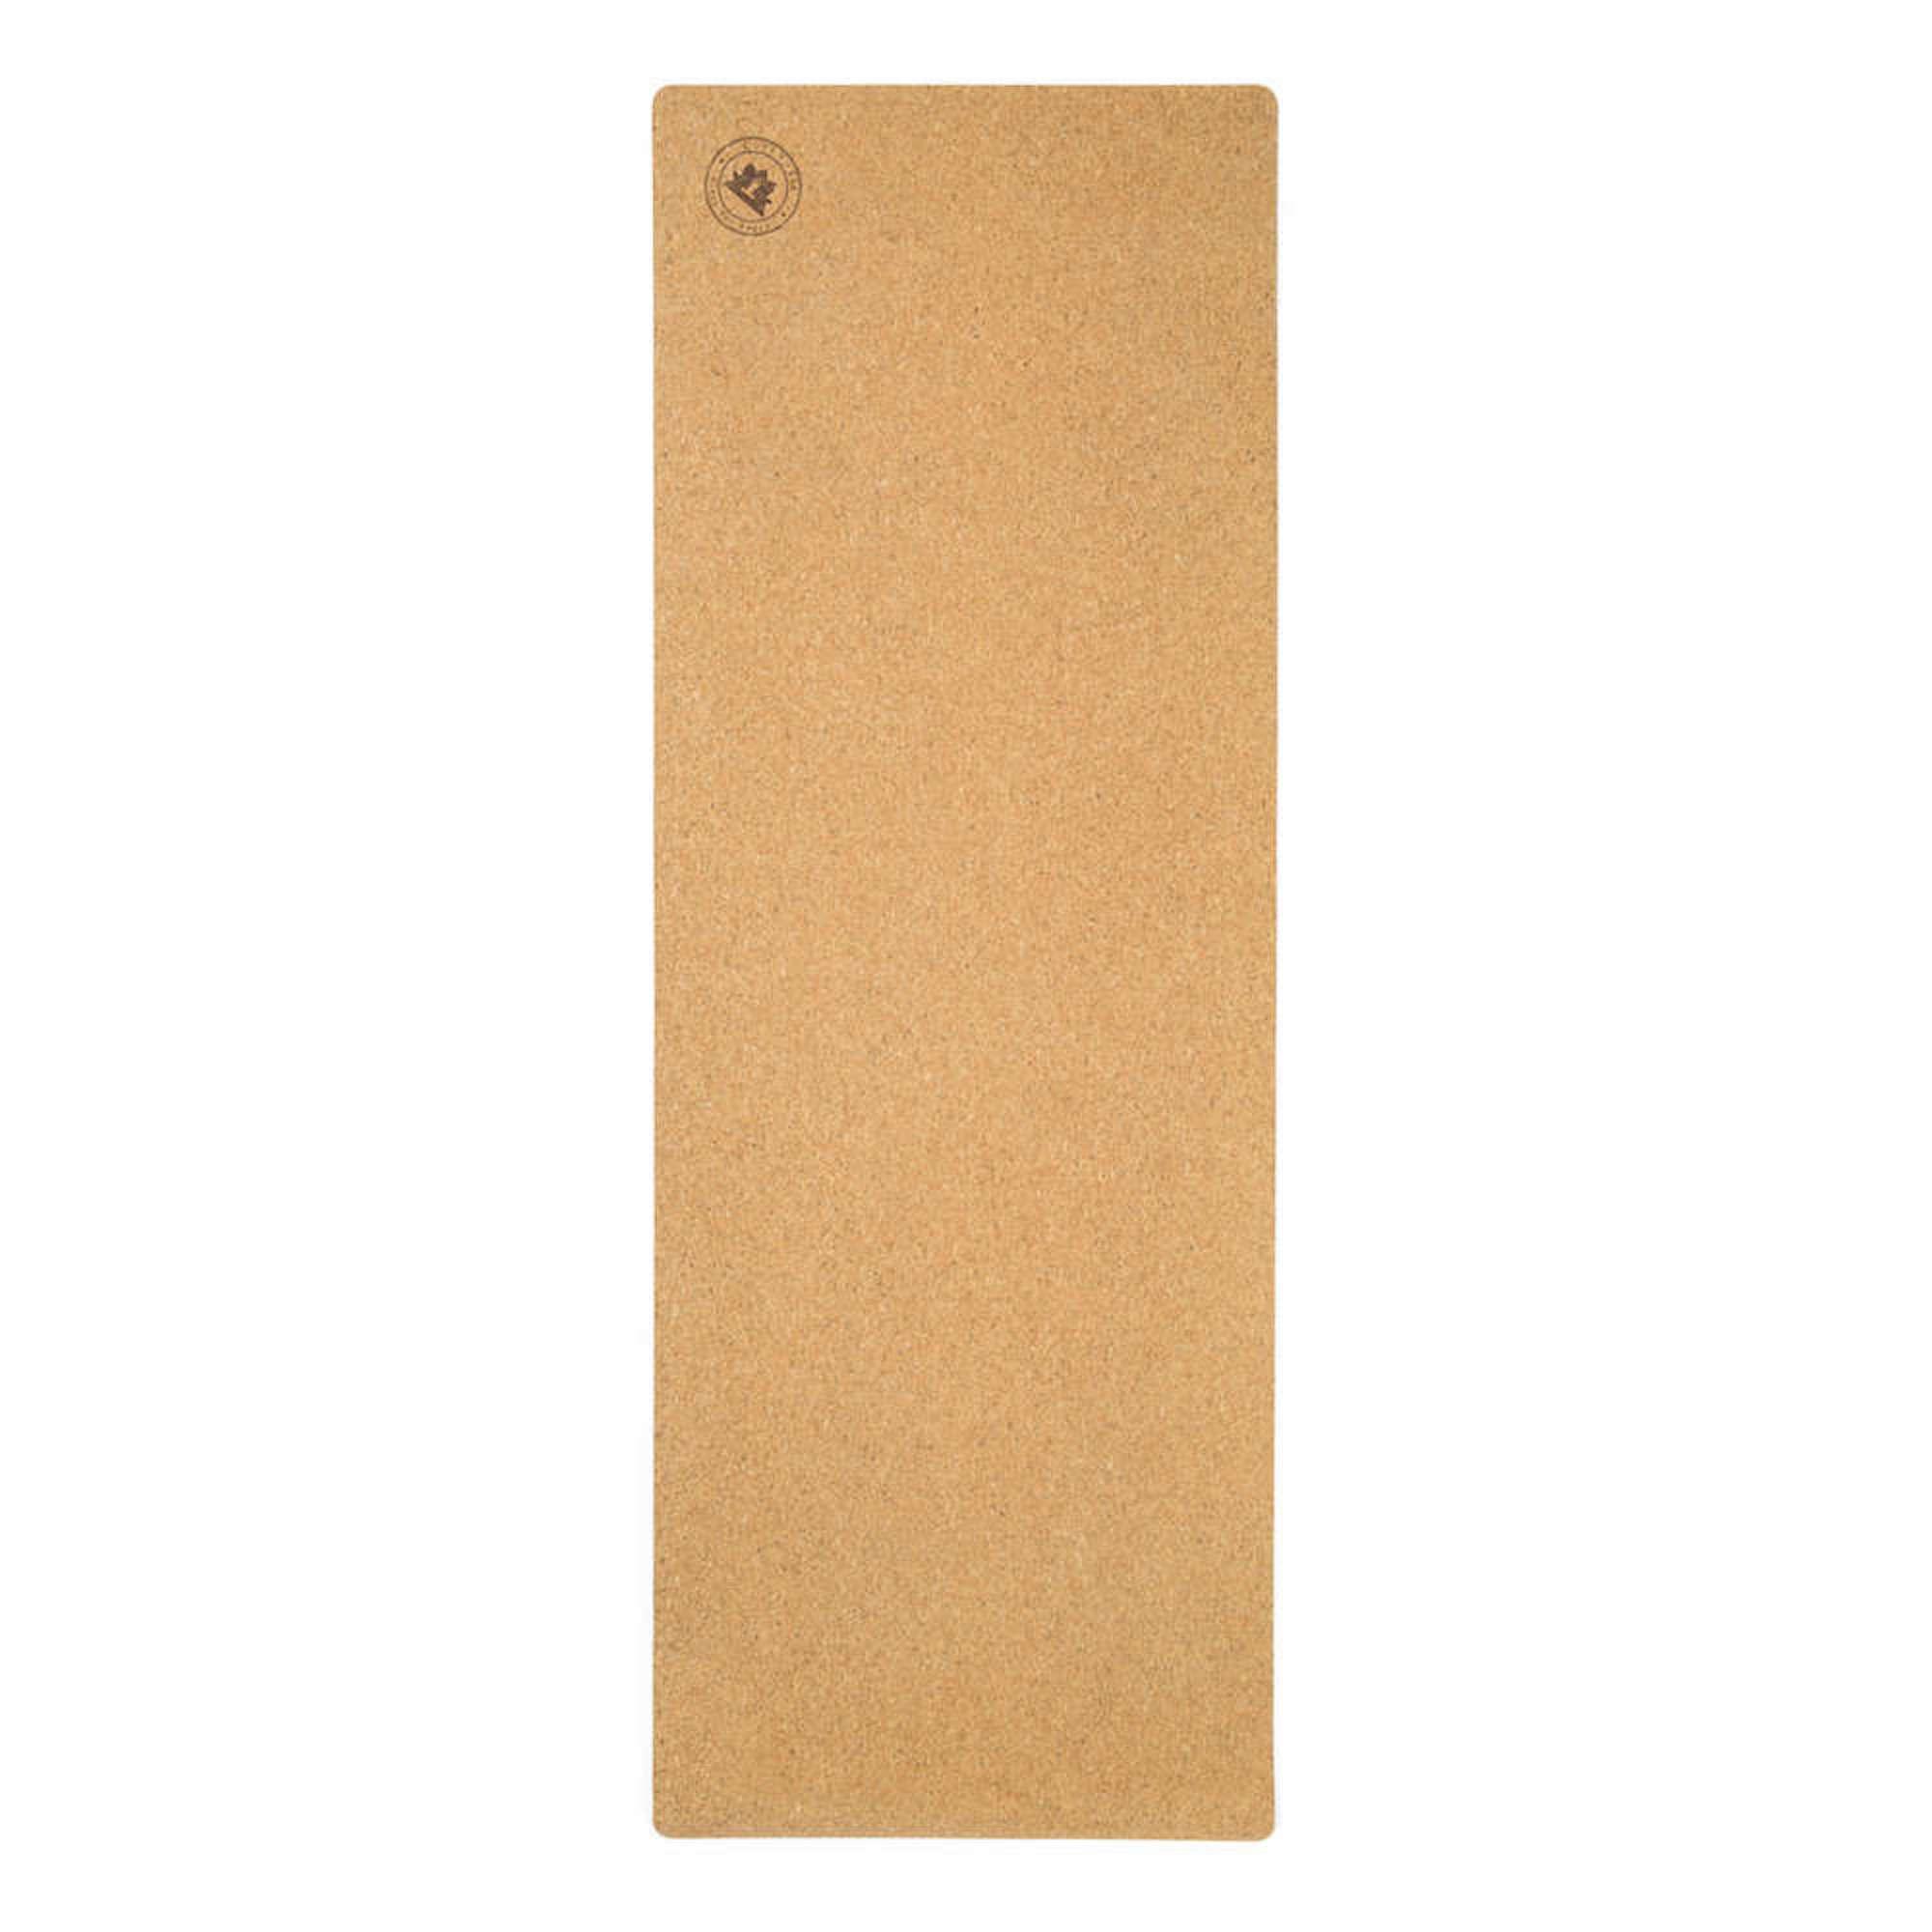 Cork Yoga Mat - Eco-friendly & Non-Slip Surface UK